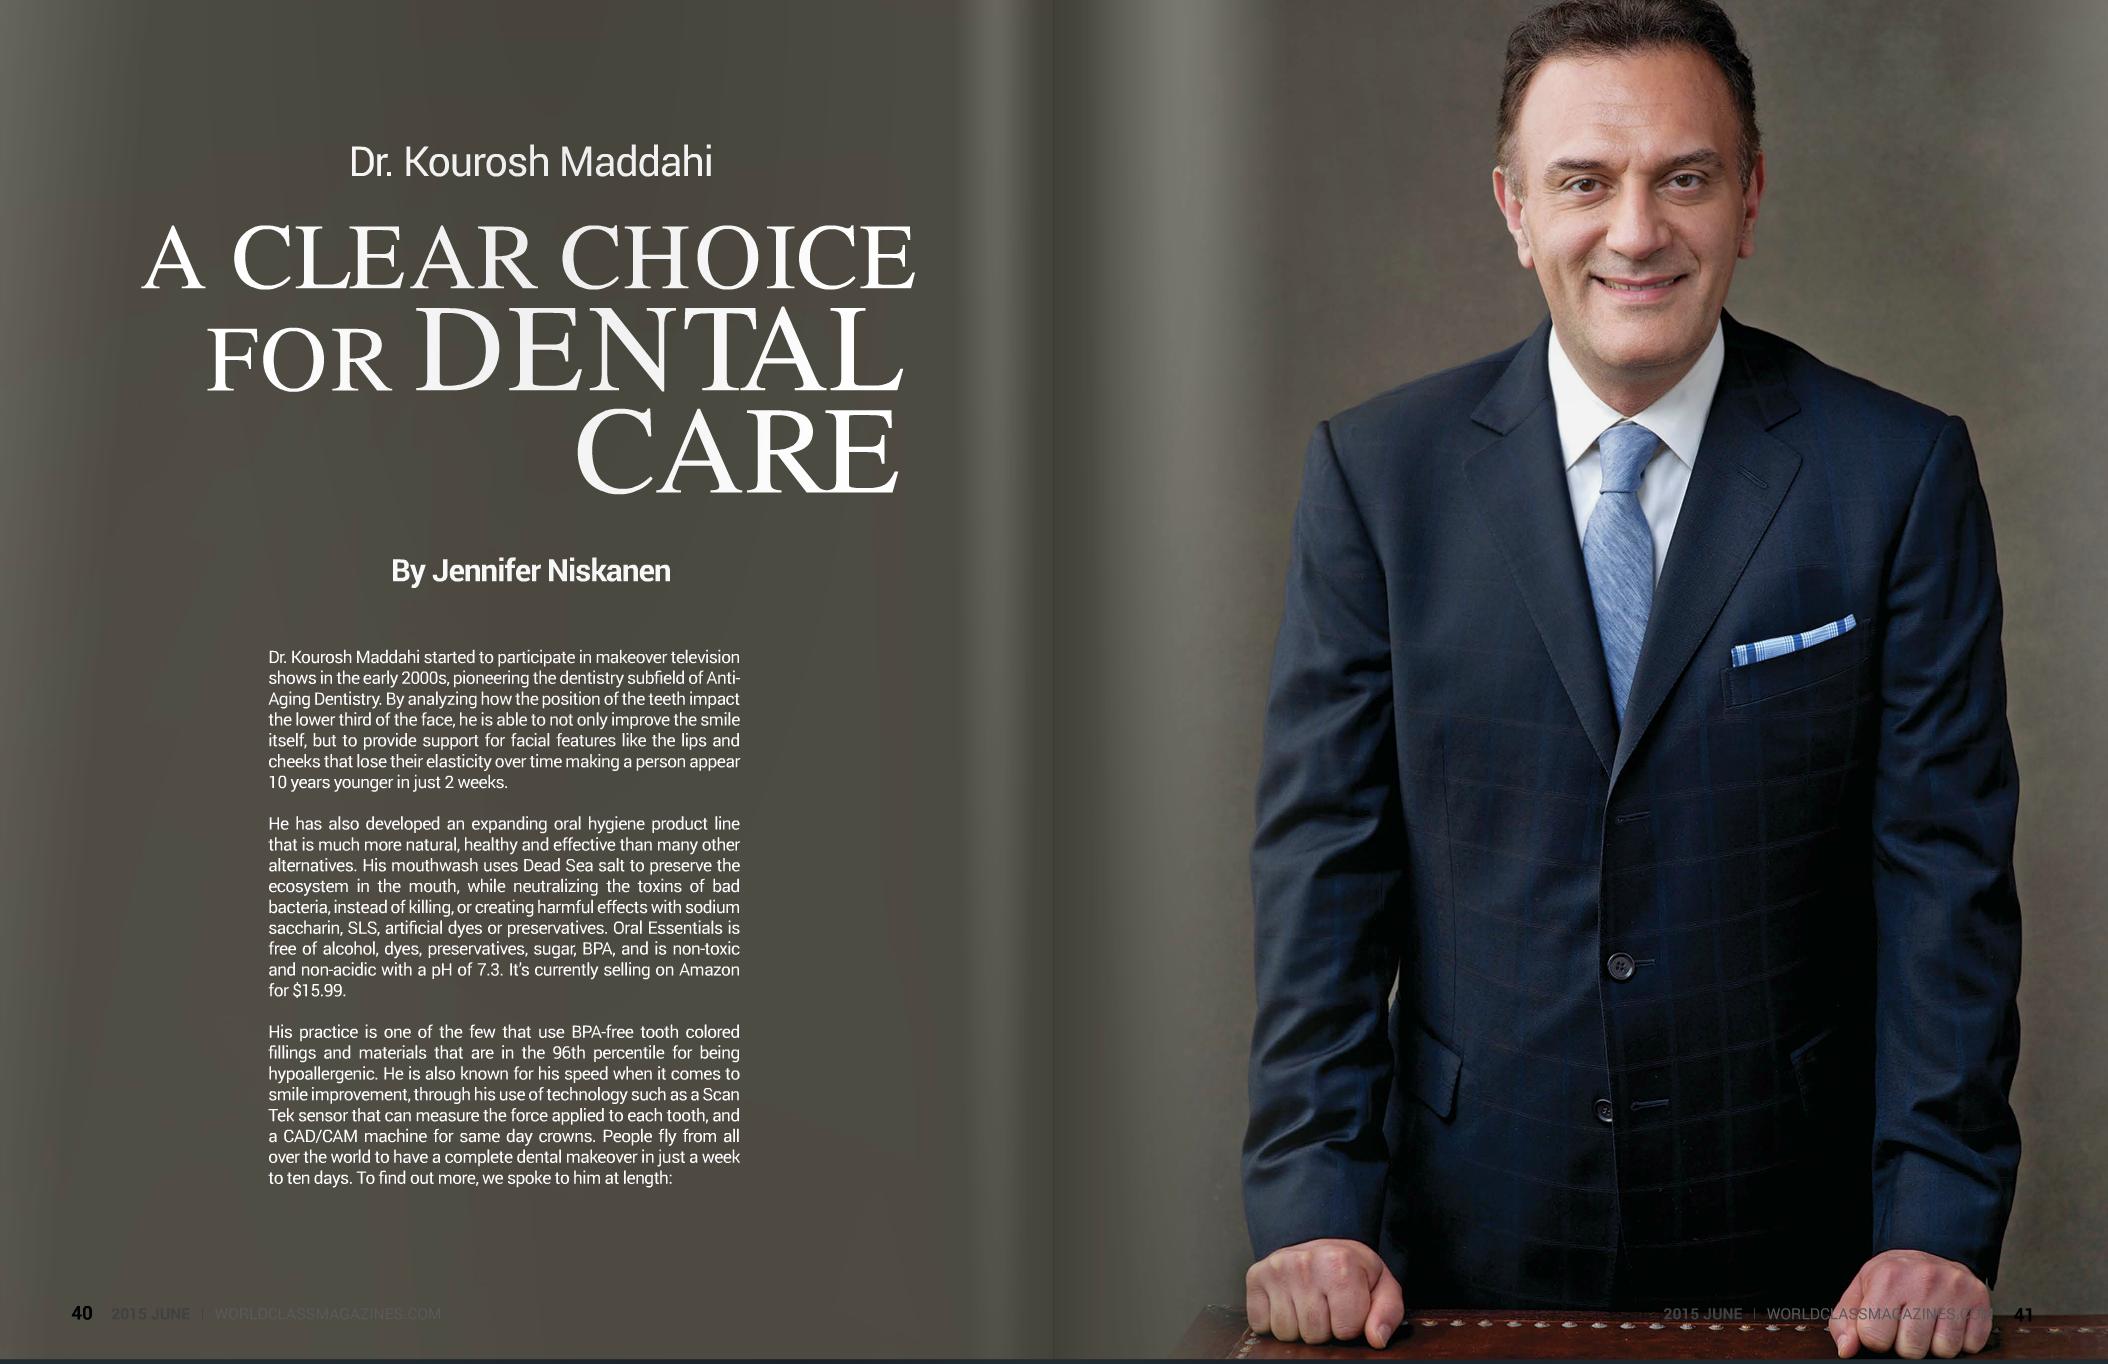 Dr. Maddahi | #WORLDCLASS Magazines